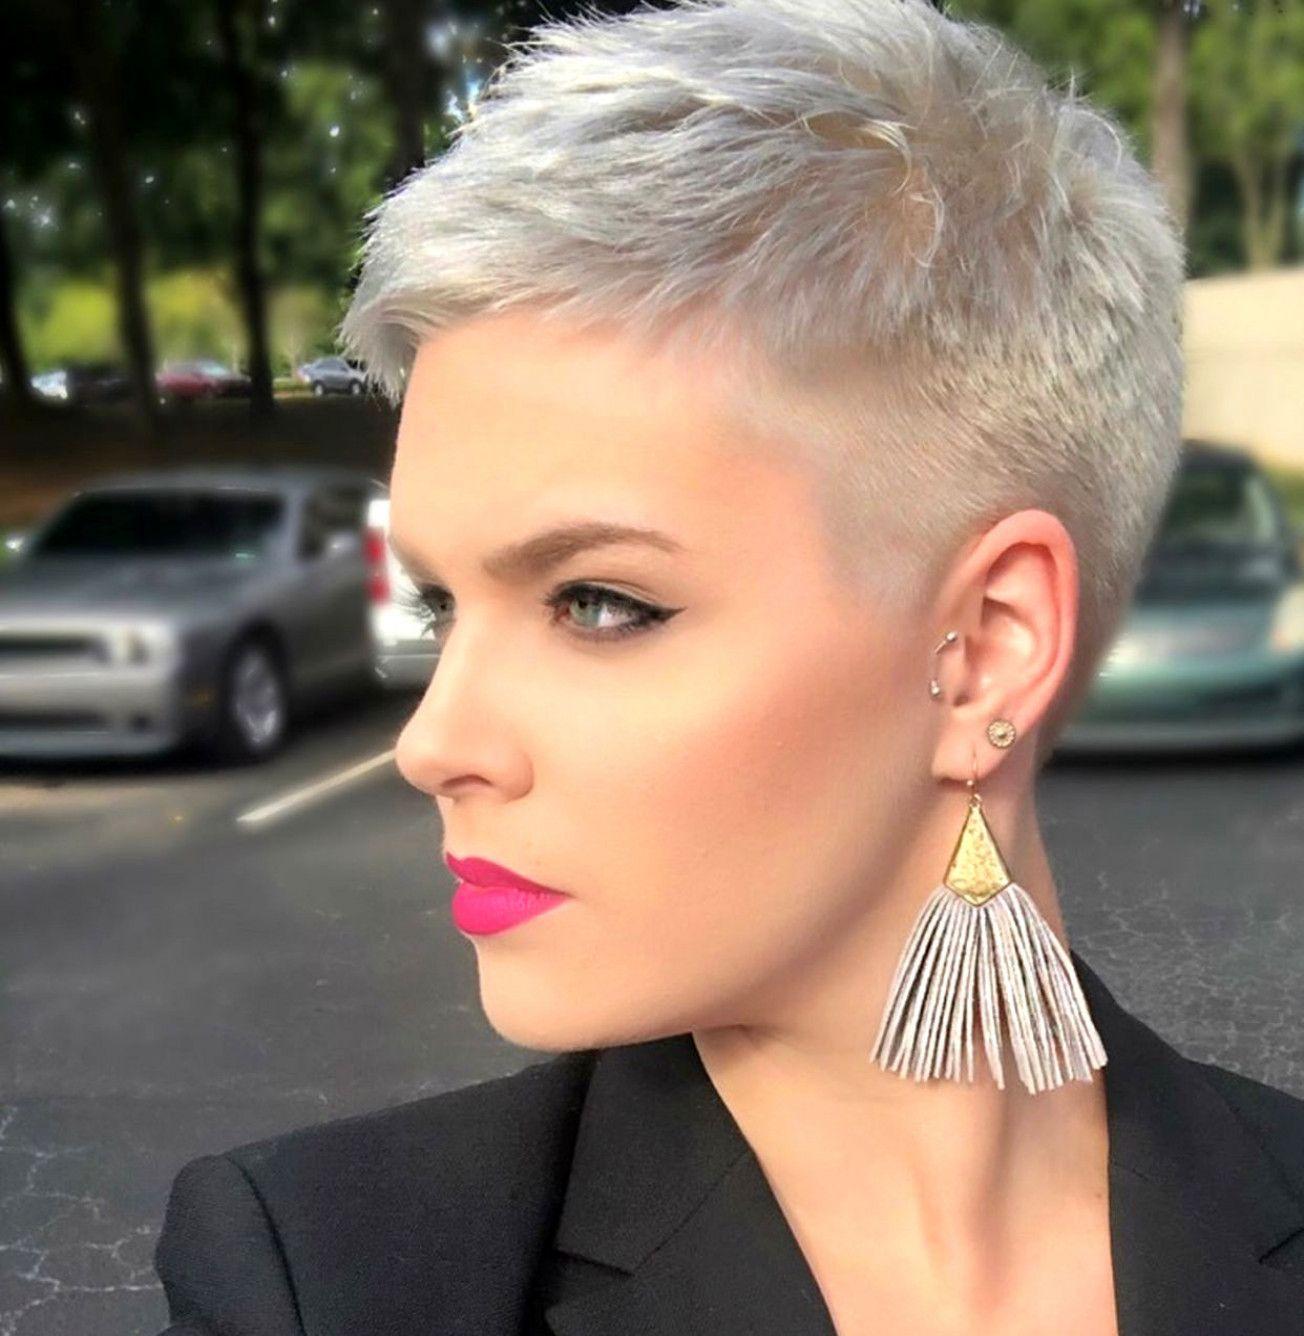 hairdare womenshair beauty hairstyles shorthair